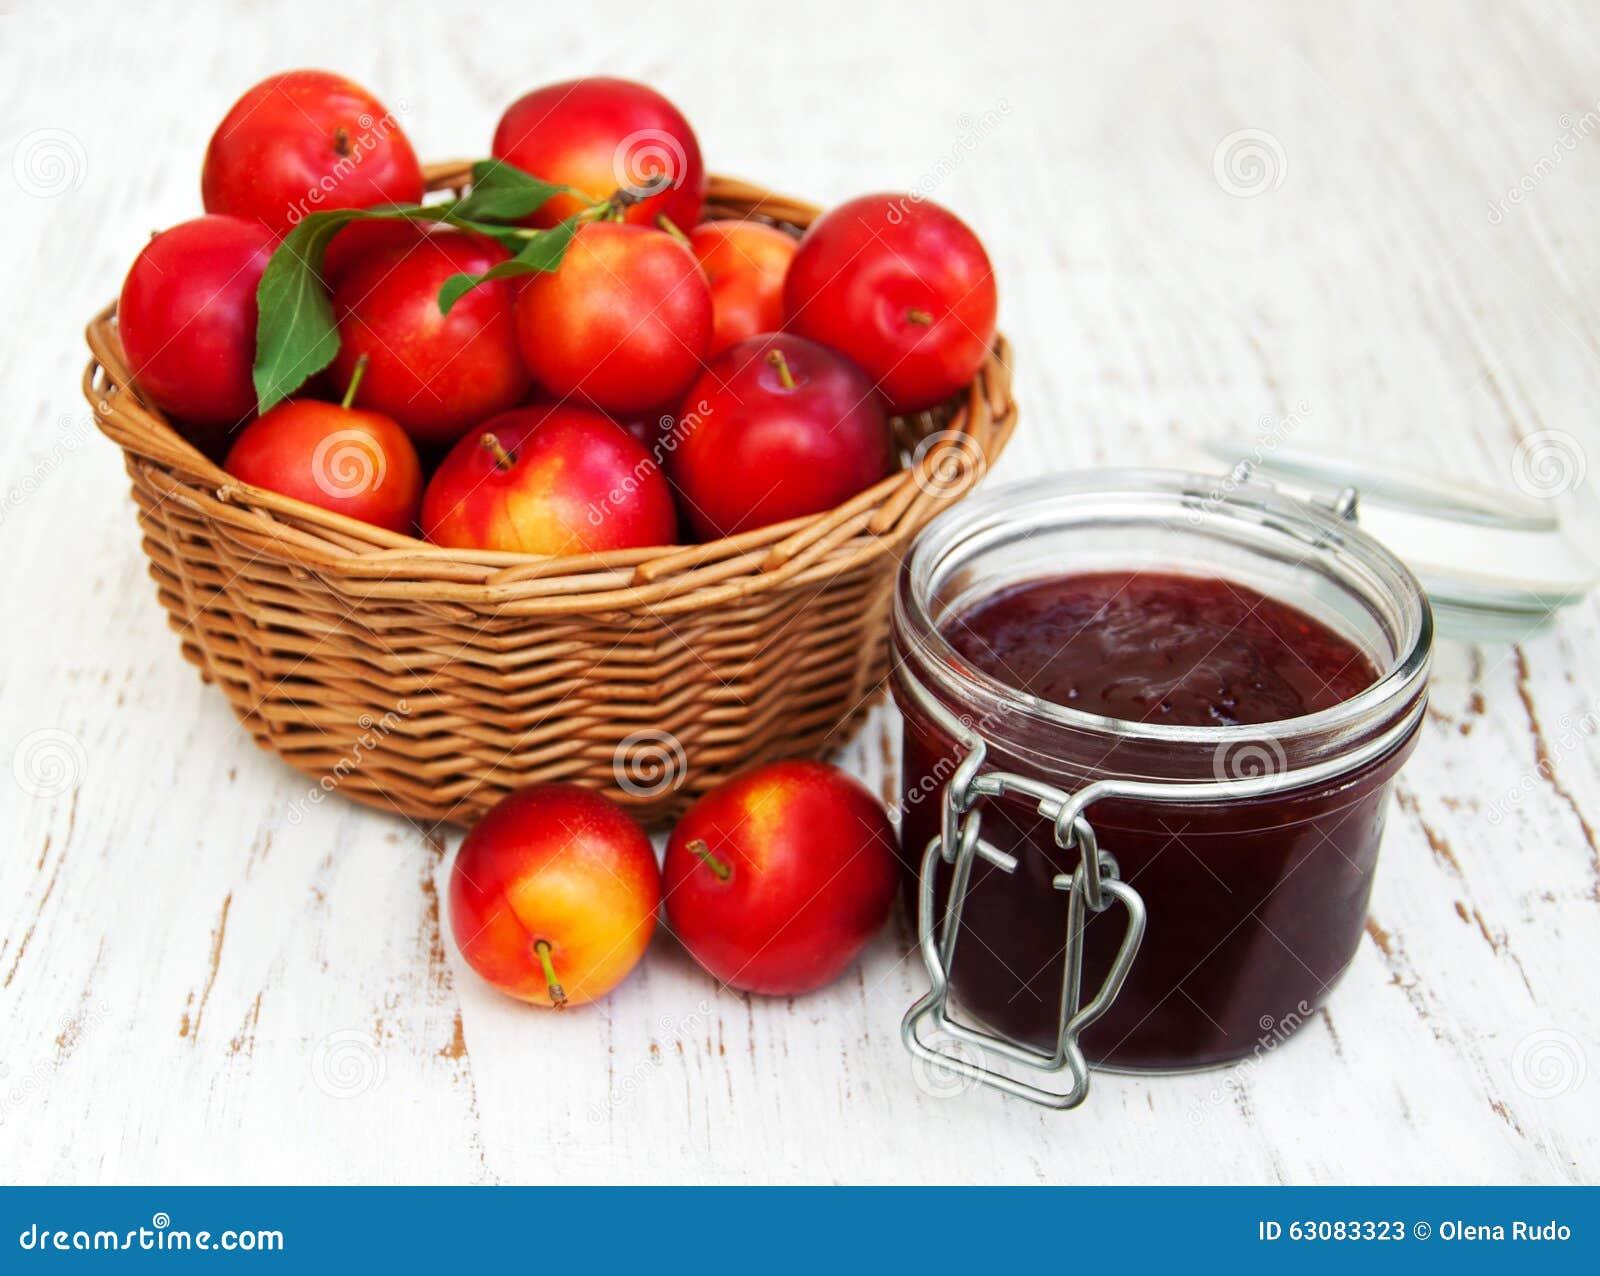 Download Plum Jam image stock. Image du dessert, fruit, préservation - 63083323